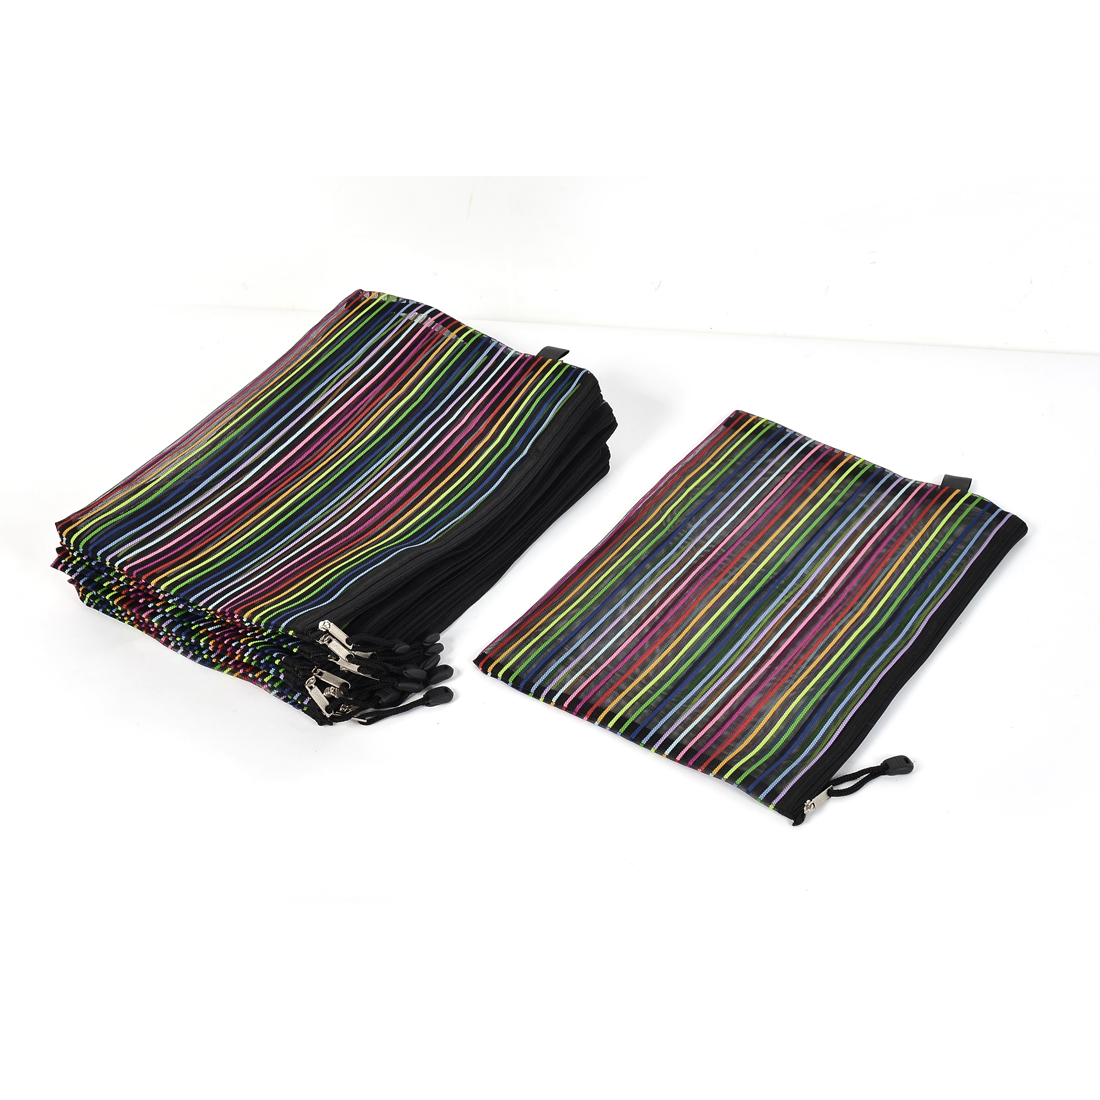 Unique Bargains Stationery Rainbow Style Stripes Pattern Mesh A4 Zipper File Bag Folder 12pcs